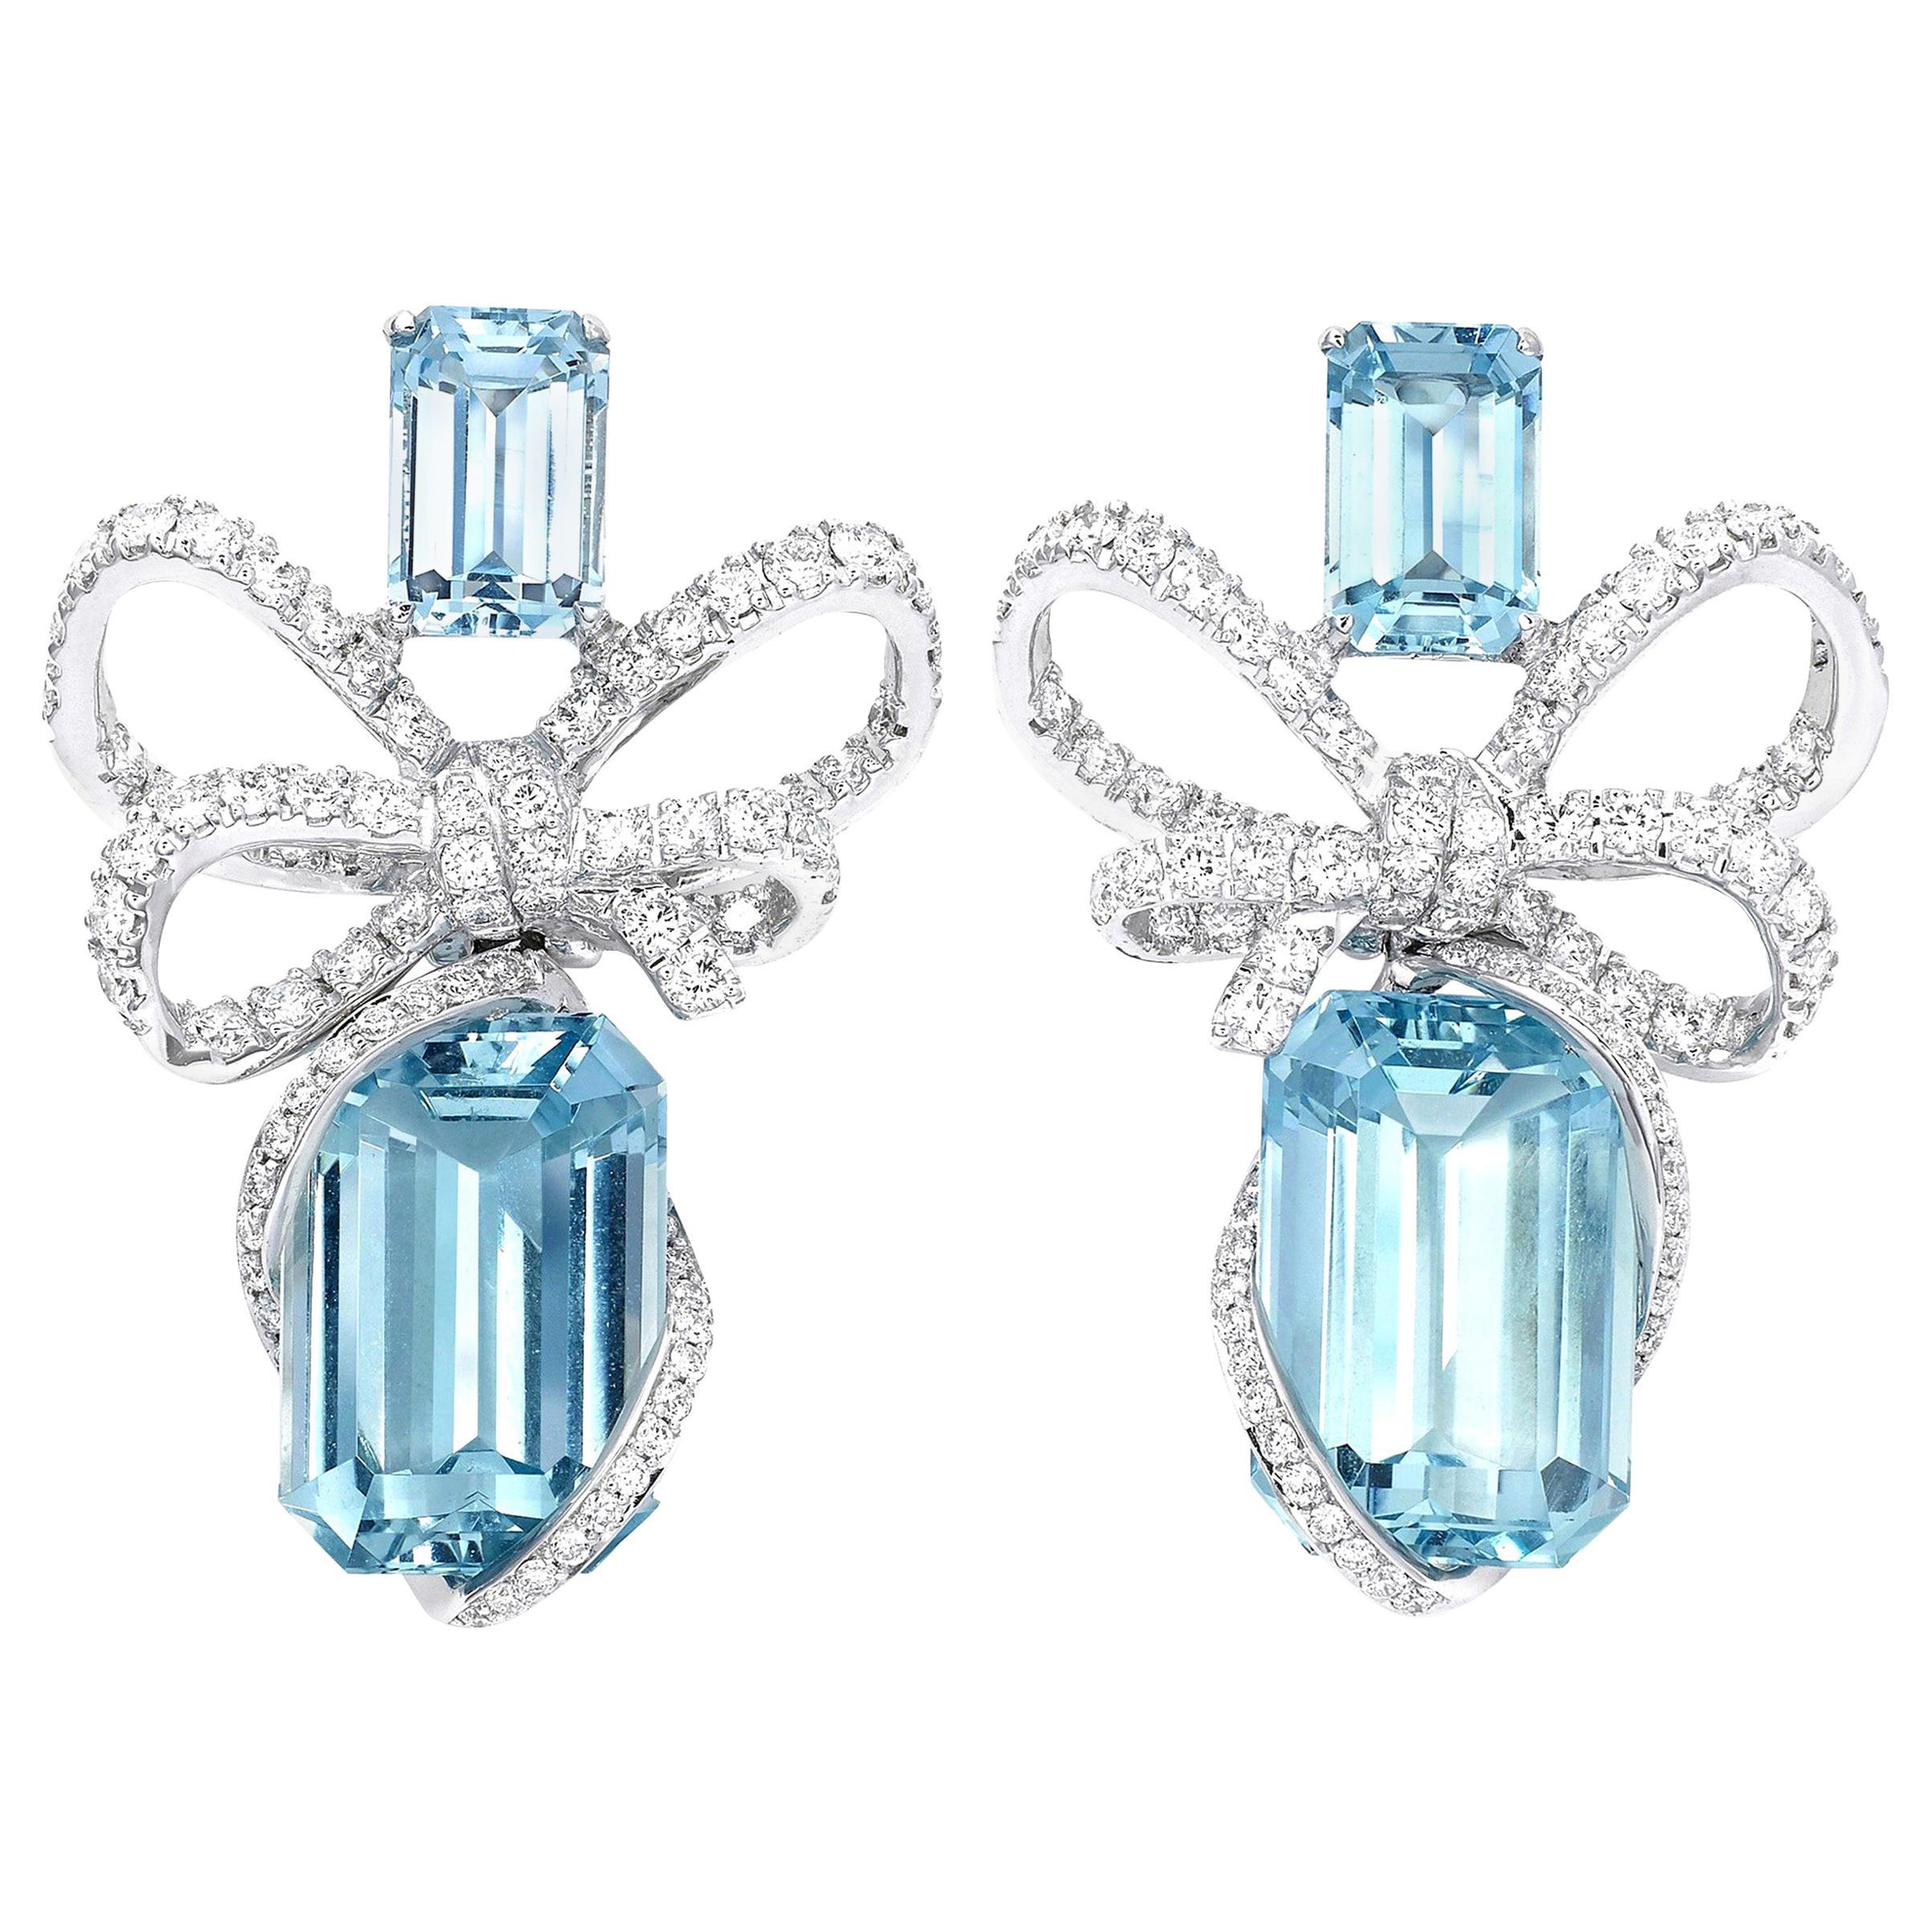 18 Karat White Gold, White Diamonds and Aquamarine Bow Earrings